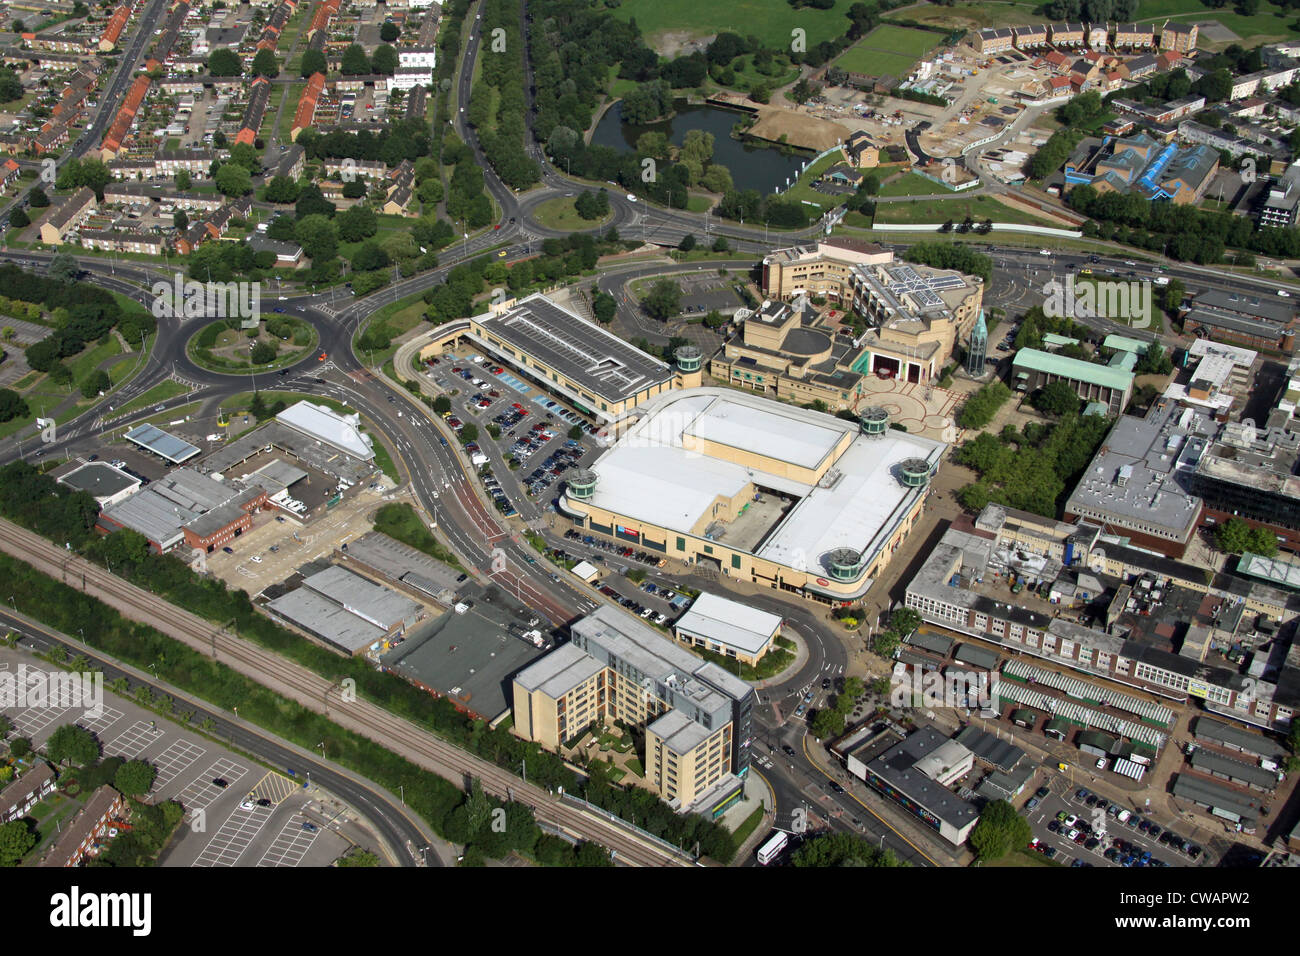 aerial view of Westgate Park shopping centre, Roundacre, Basildon, Essex - Stock Image